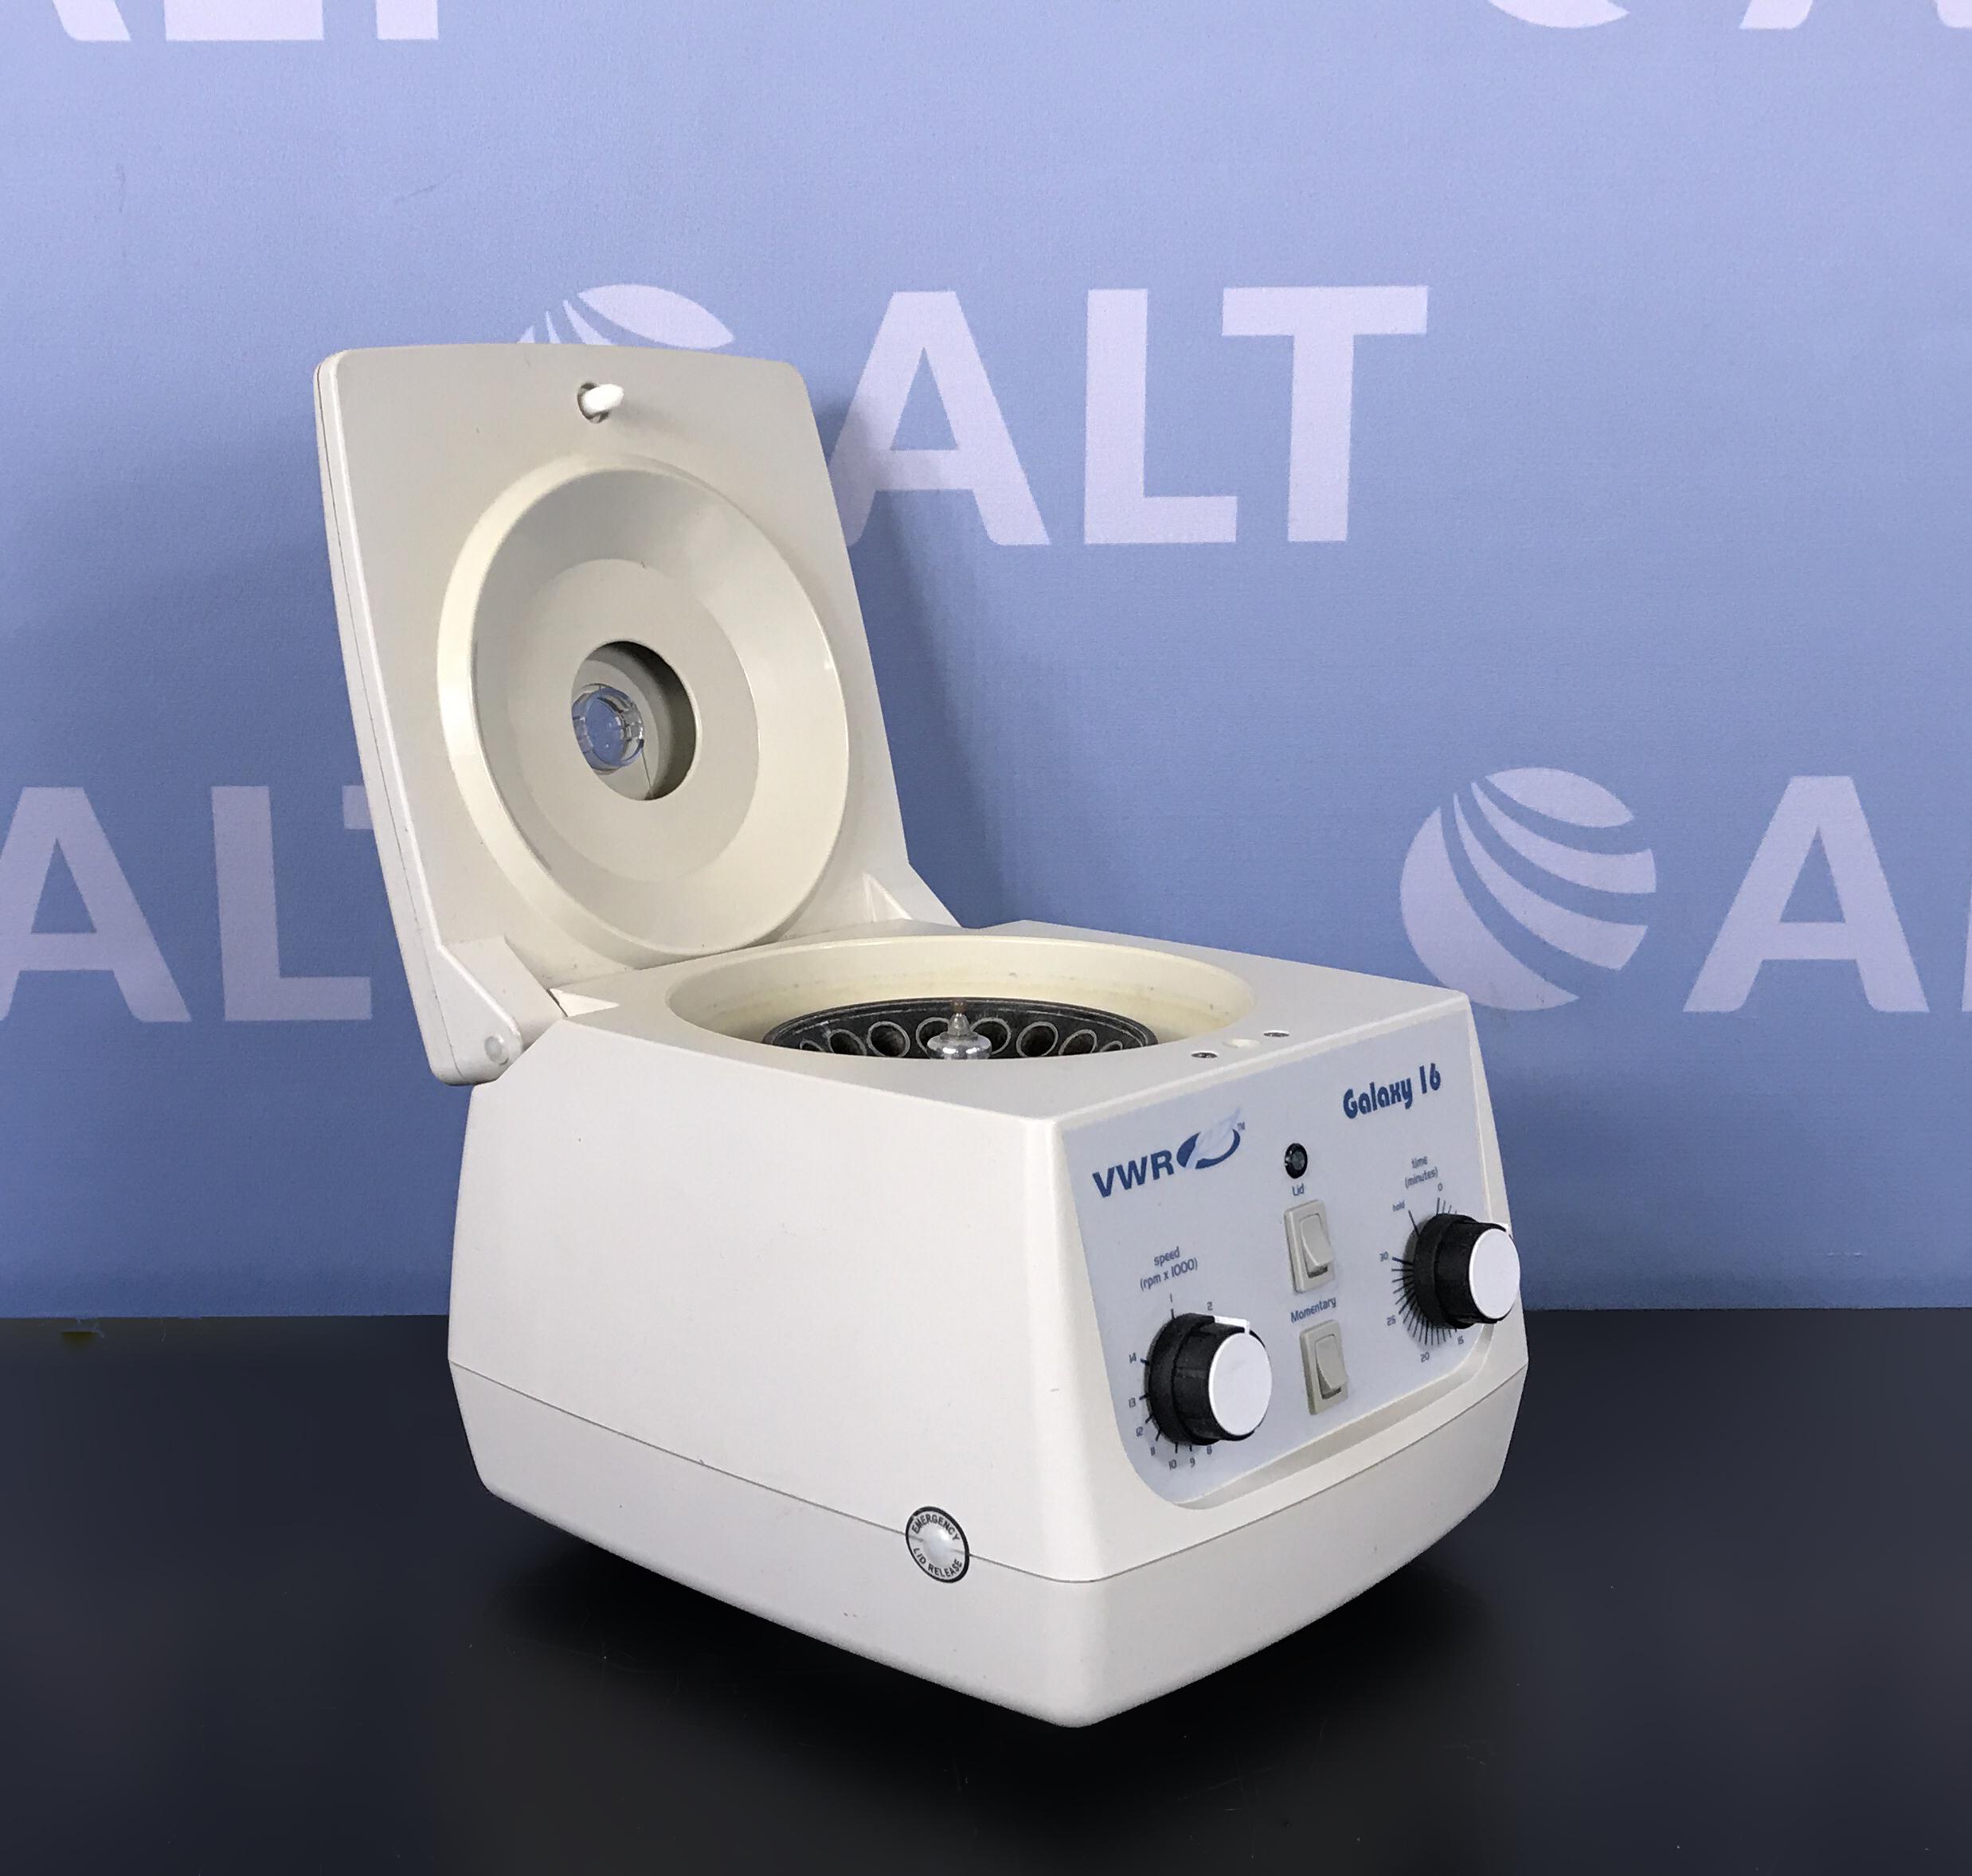 VWR Galaxy 16 Analog Microcentrifuge Image